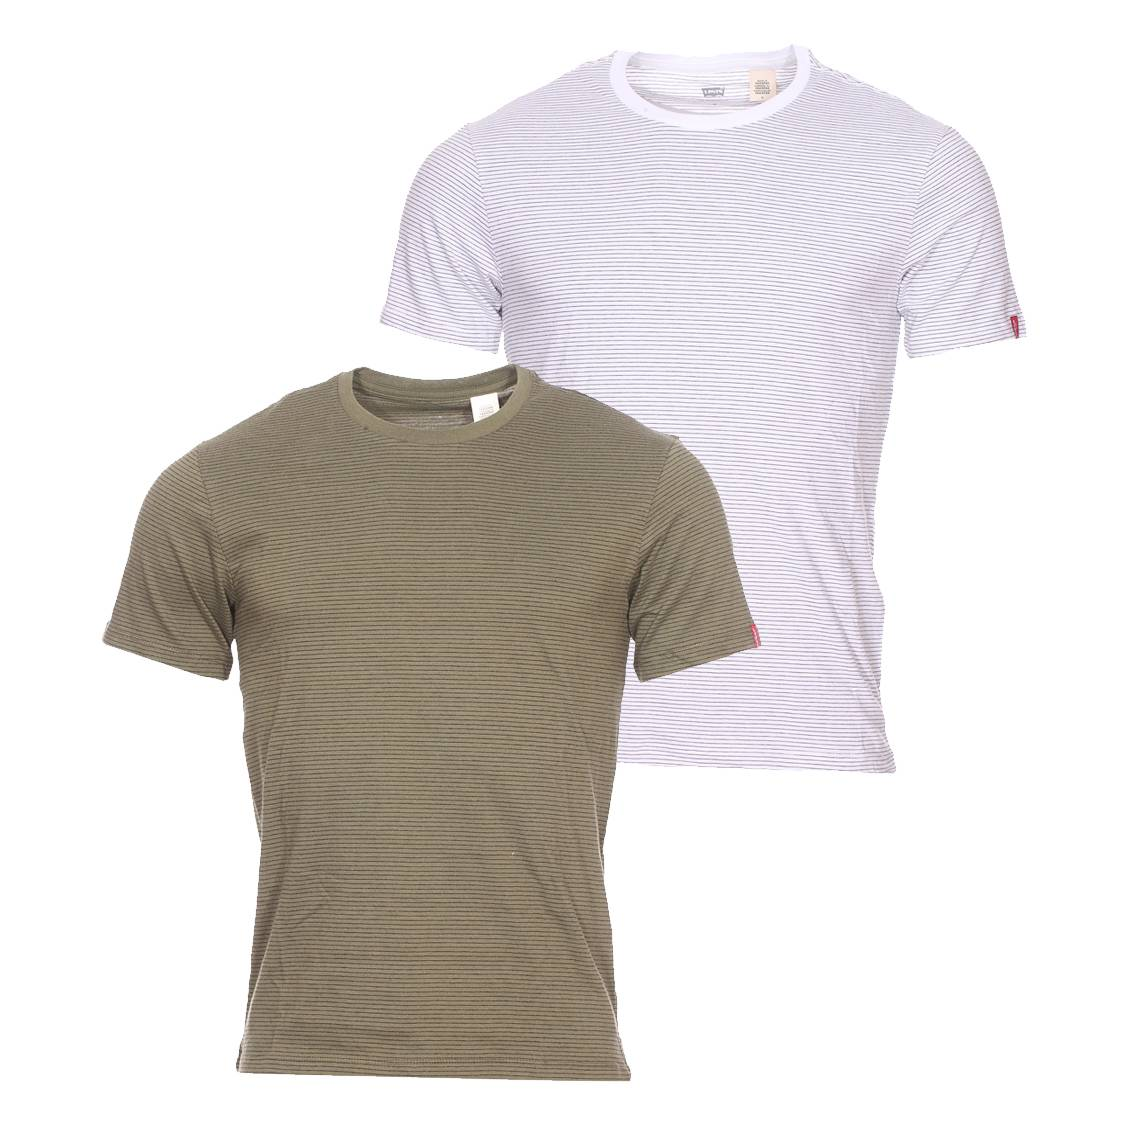 lot de 2 tee shirts levi 39 s slim en coton vert kaki et. Black Bedroom Furniture Sets. Home Design Ideas